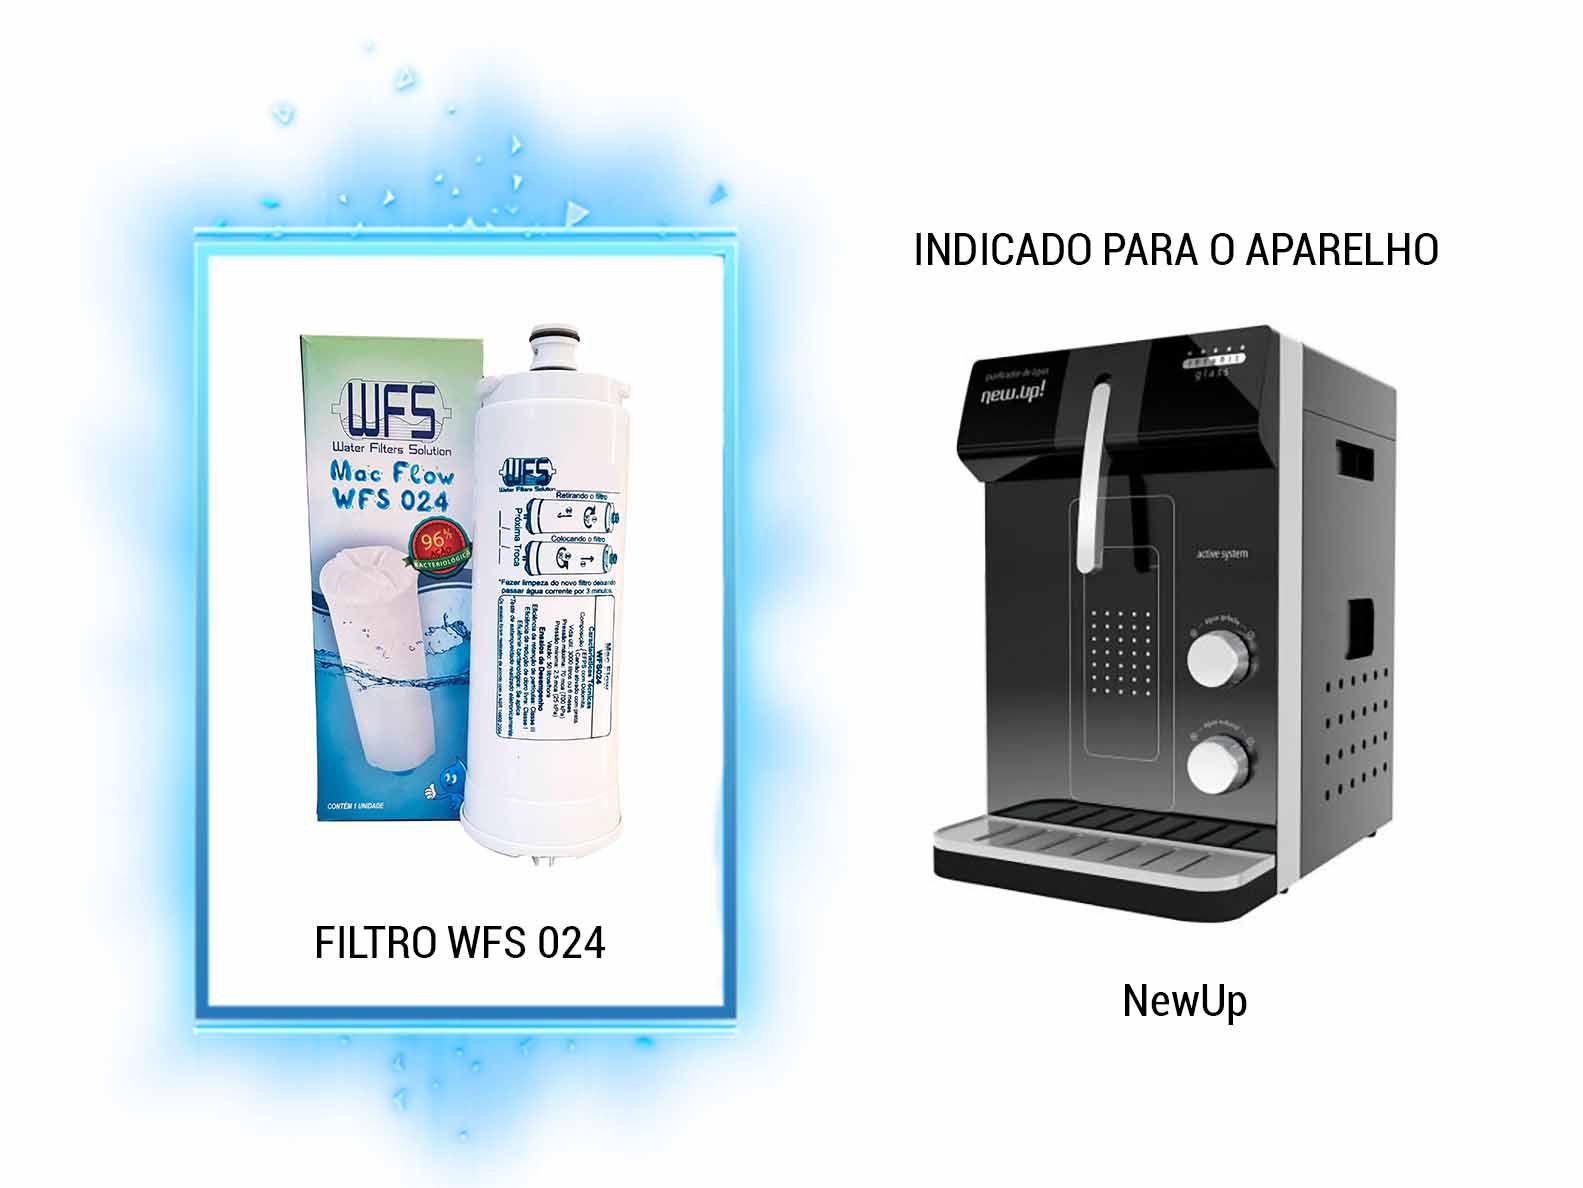 Refil para Filtro Purificador Wfs 024   Mac Flow